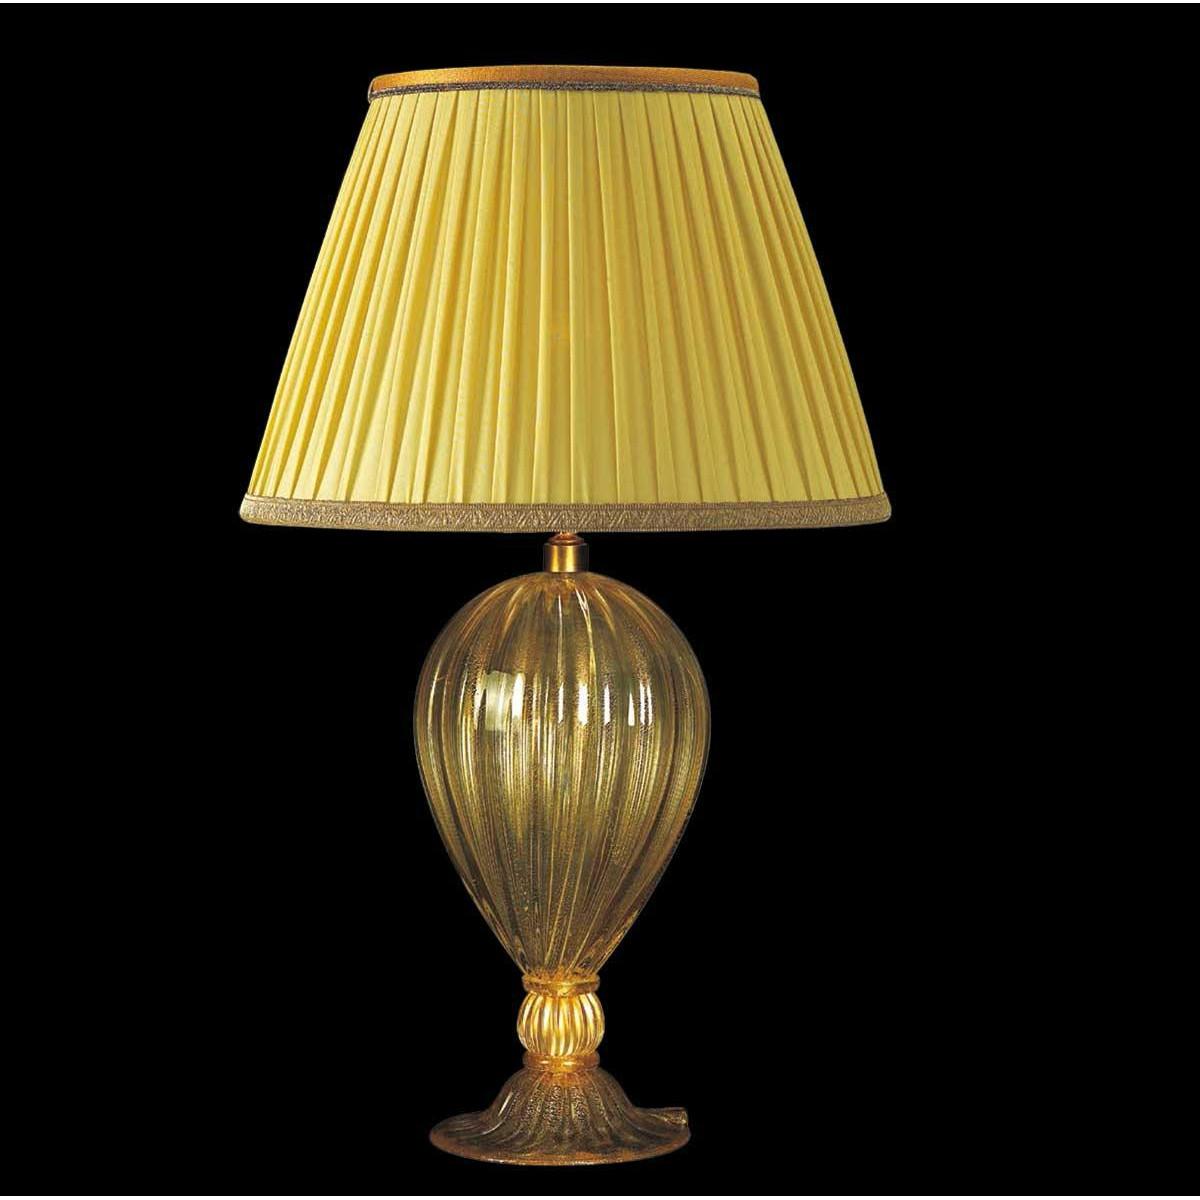 """Caleido"" lampara de sobremesa de Murano - 1 luce - ámbar y oro"